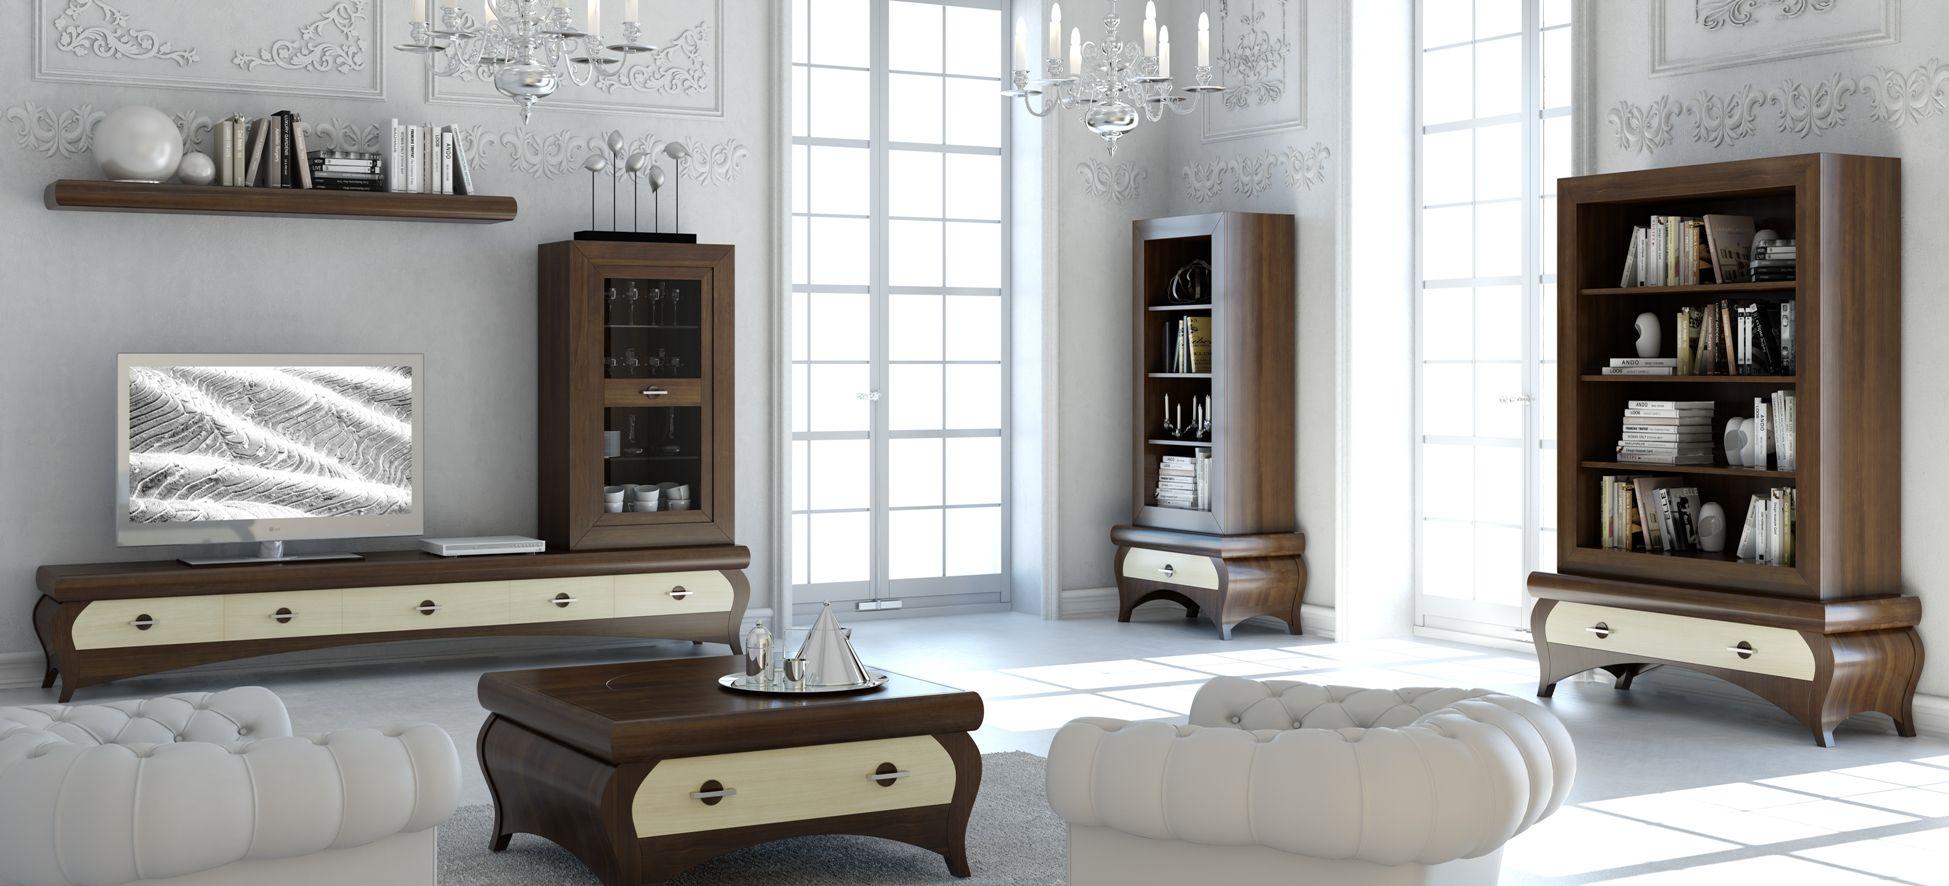 Muebles Lancha Una Firma Diferente Muebles Gimenez Muebles  # Muebles Hurtado